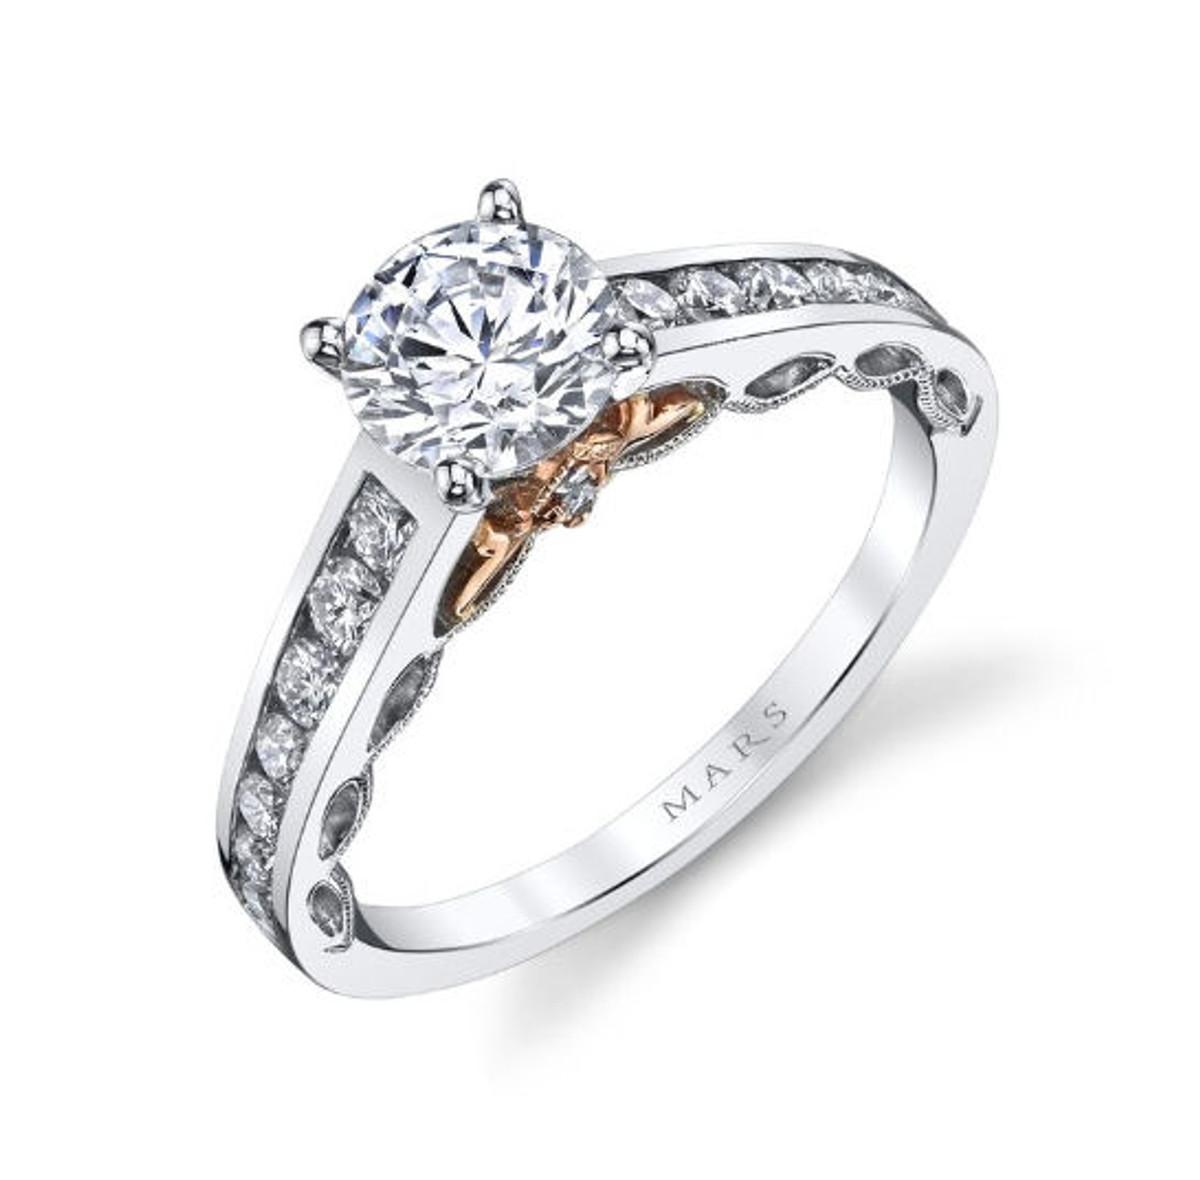 0.50 Ct Tw Diamond Engagement Ring